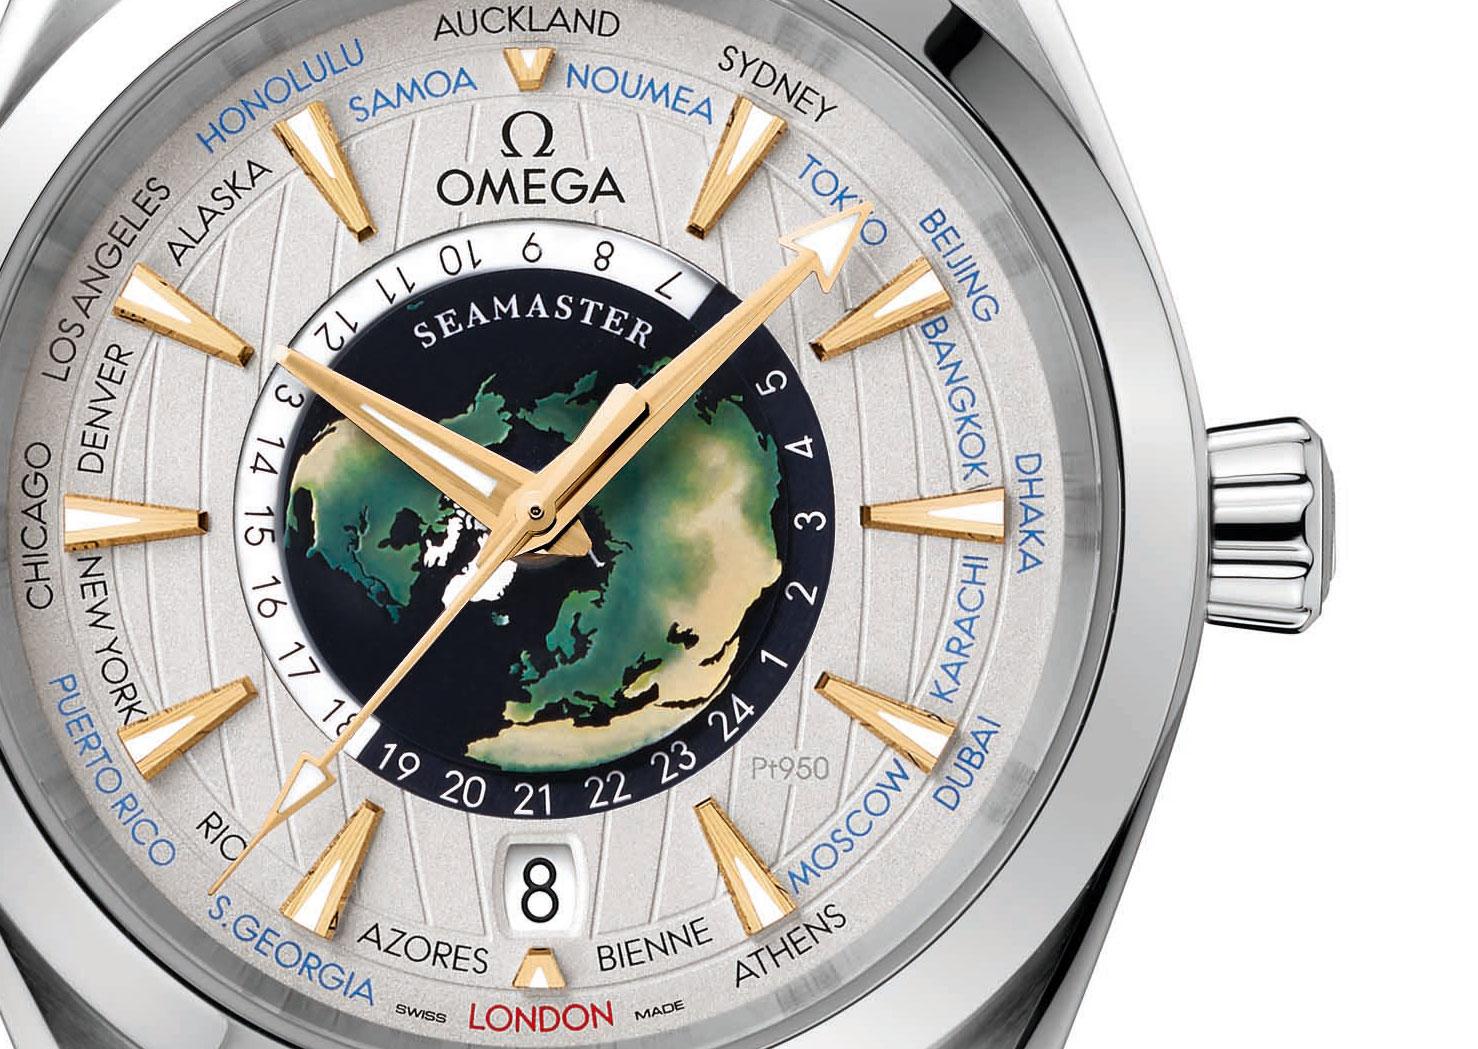 Omega Seamaster Aqua Terra Worldtimer platinum 1